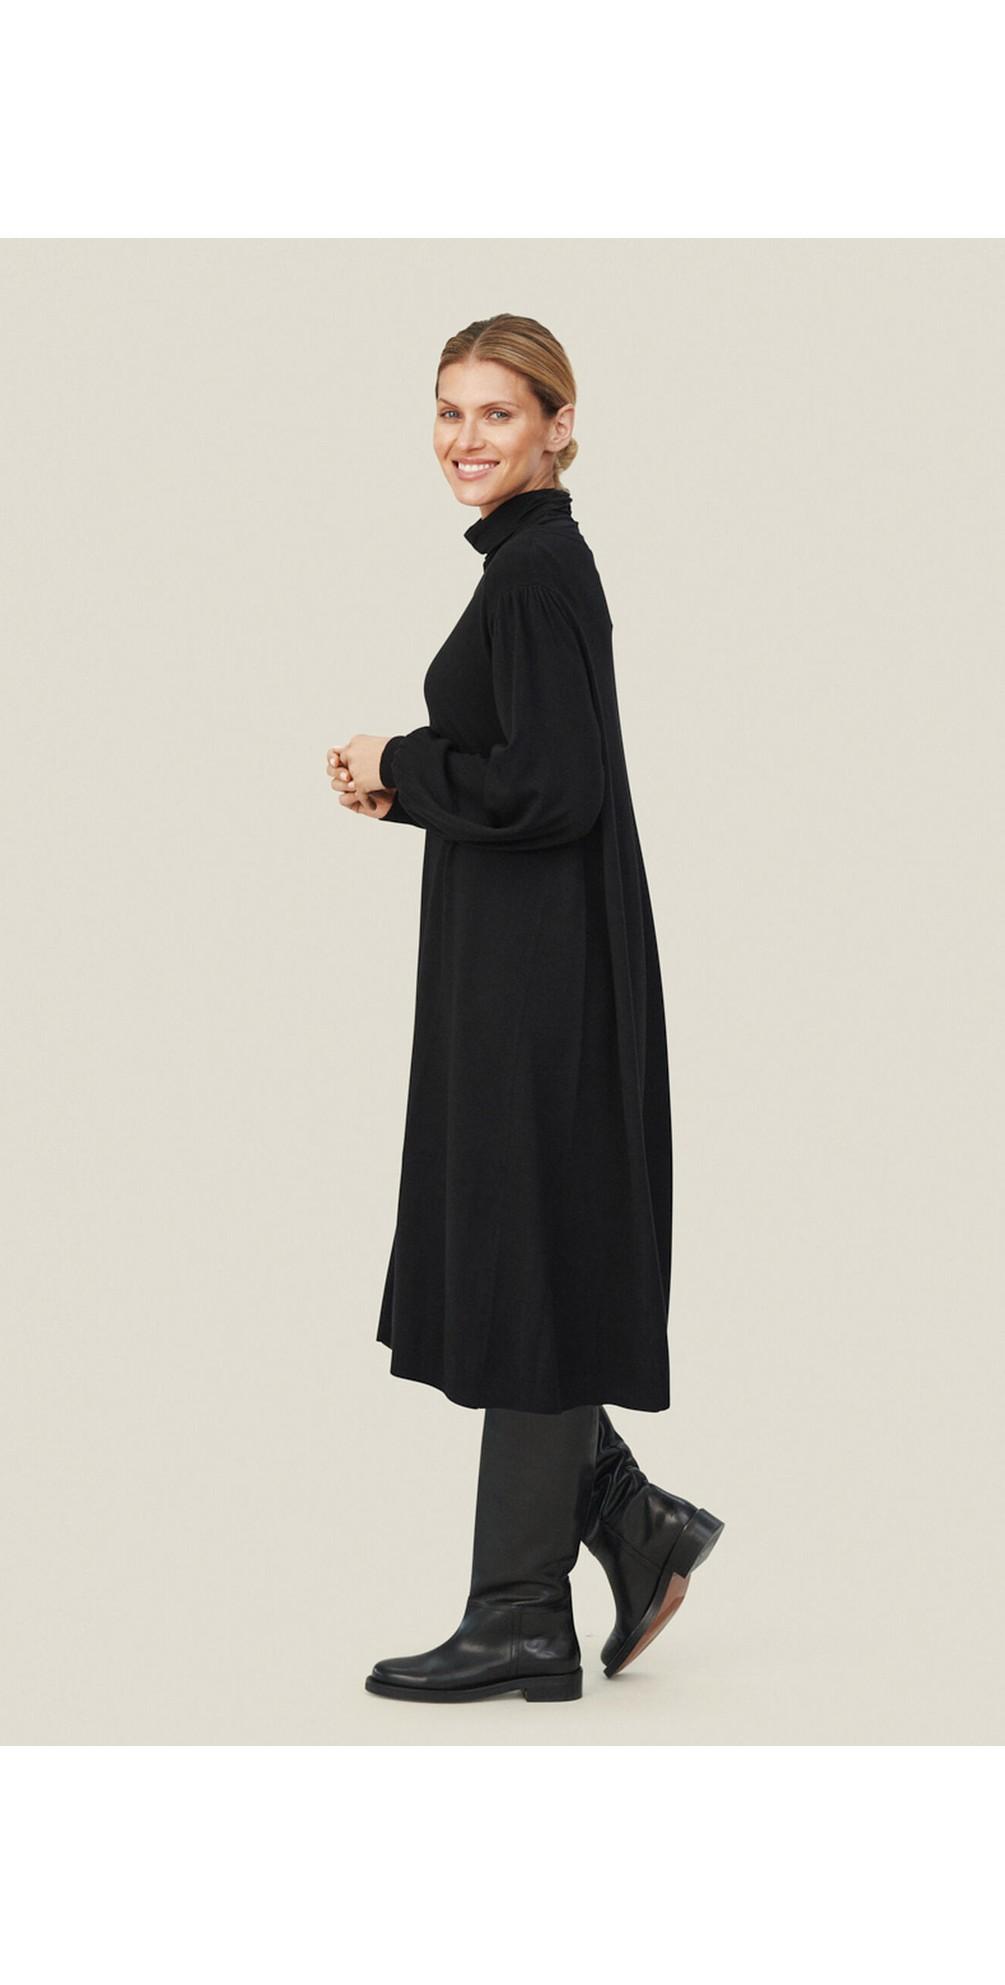 Nolina Dress main image